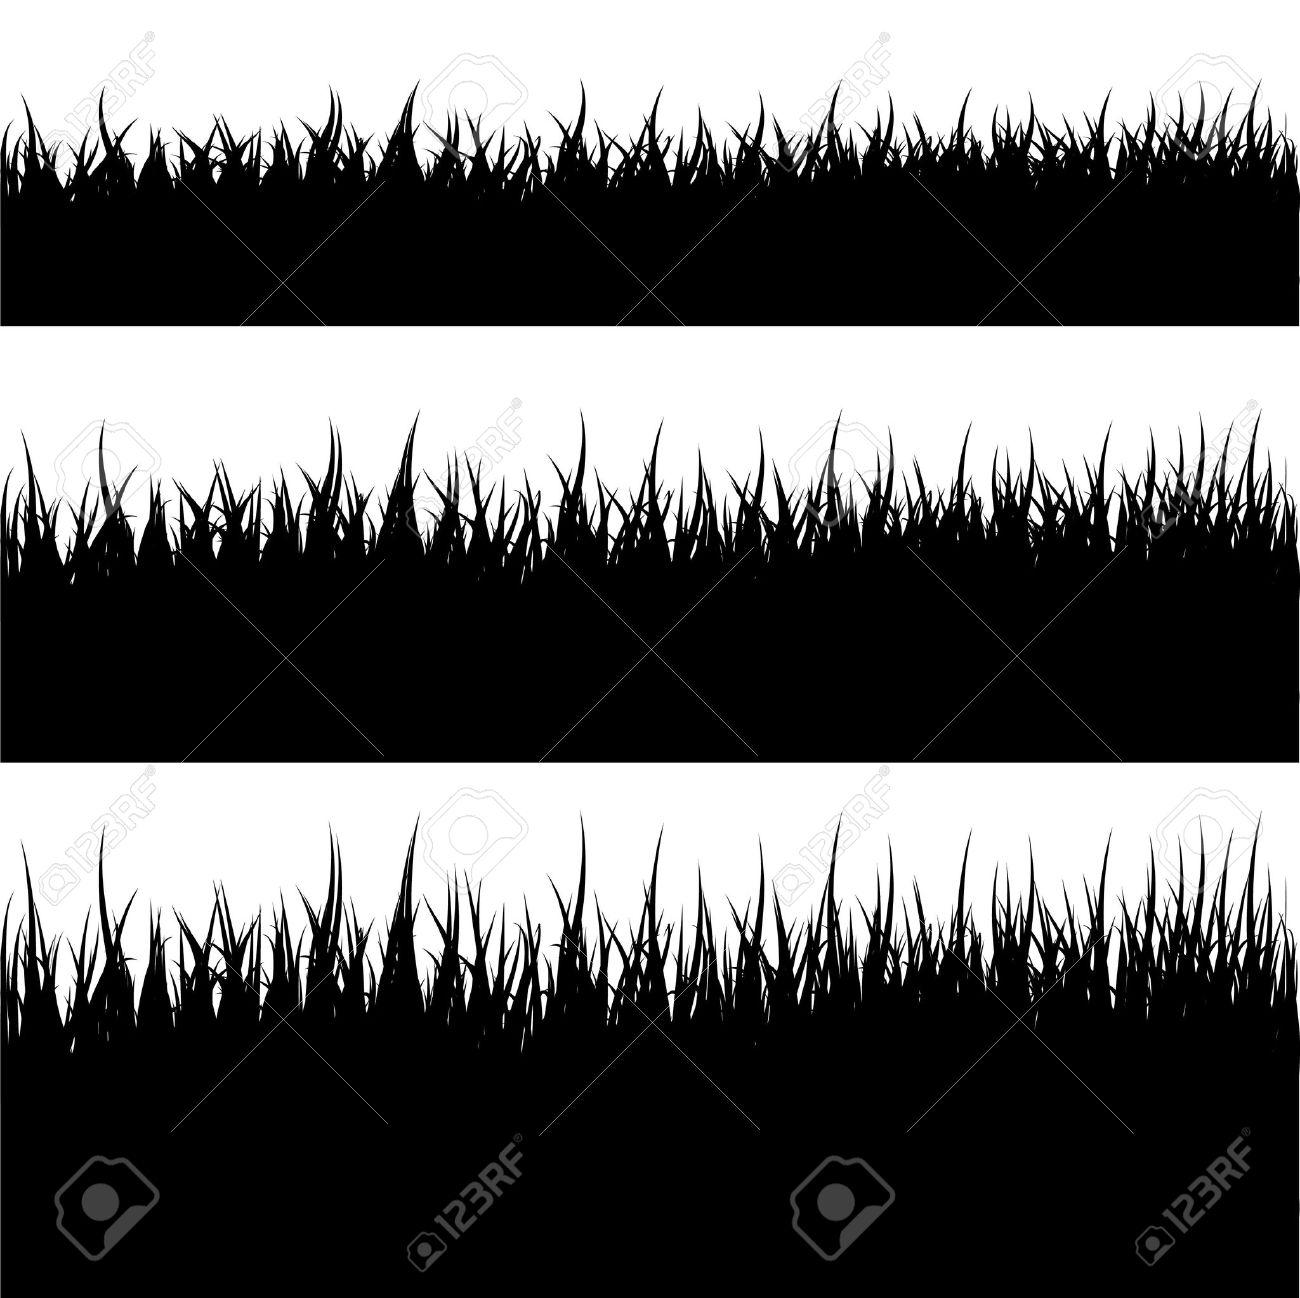 Grass Outline Vector Grass Silhouette stock vector